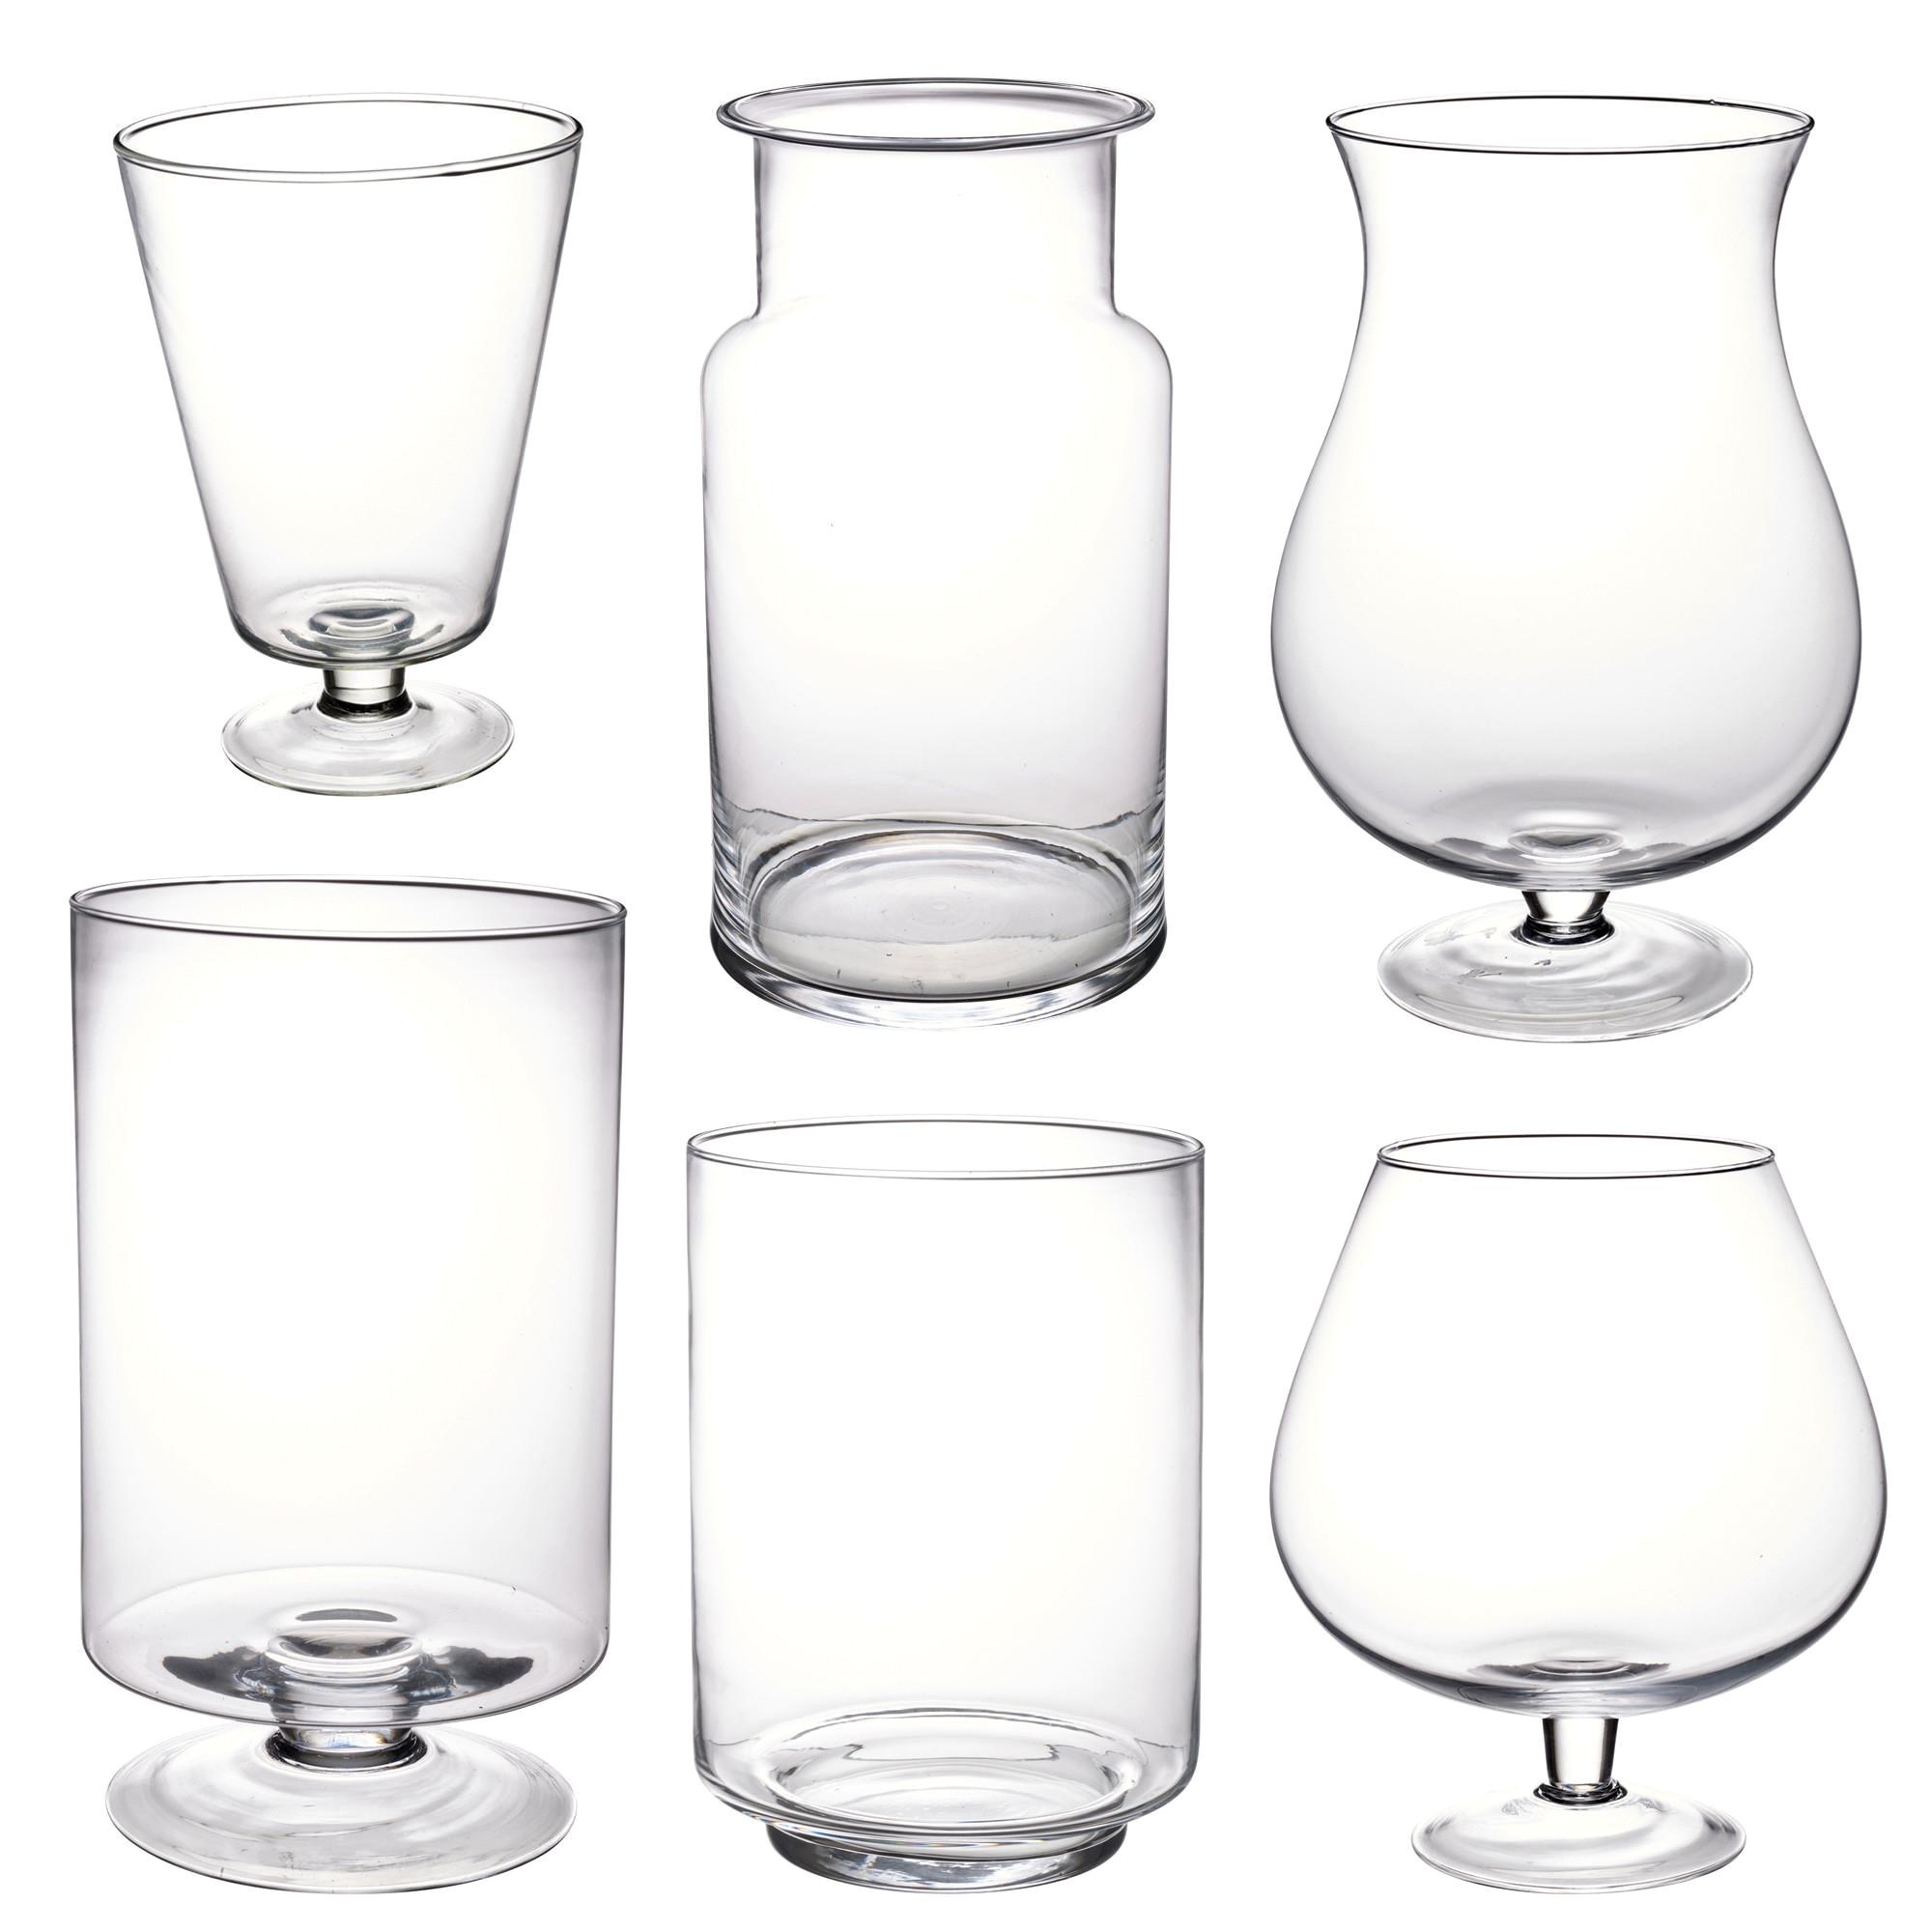 14 glass vase of walmart wedding decorations best of h vases candy vase i 0d diy in related post